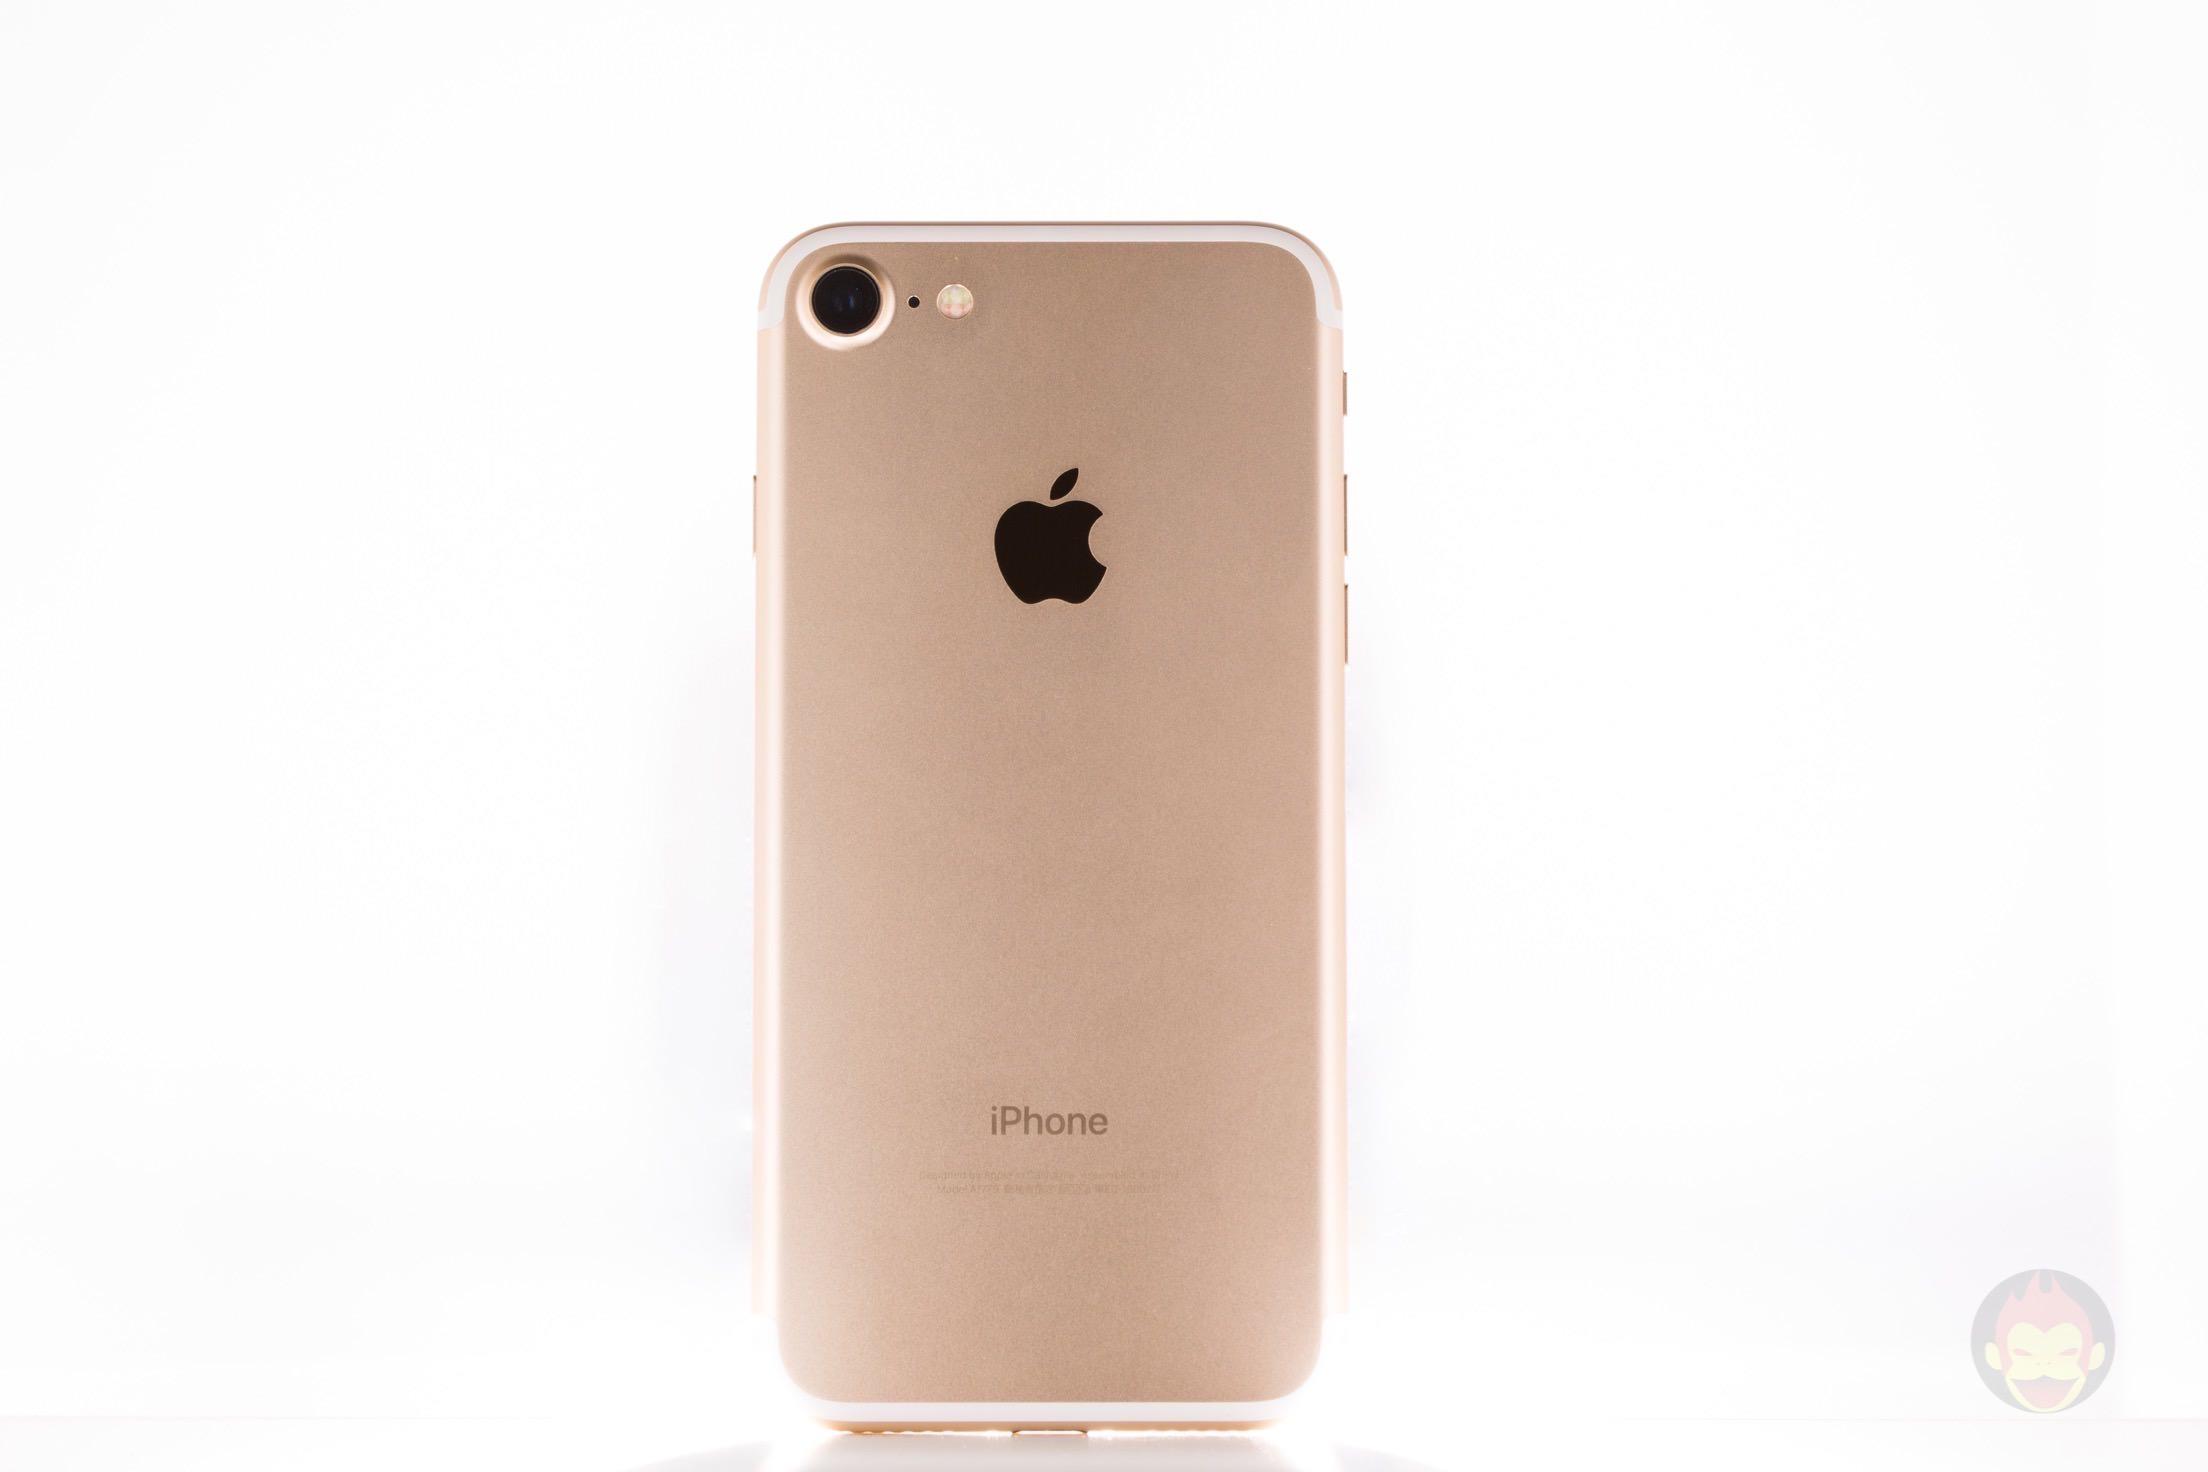 iPhone-7-Gold-Model-04.jpg